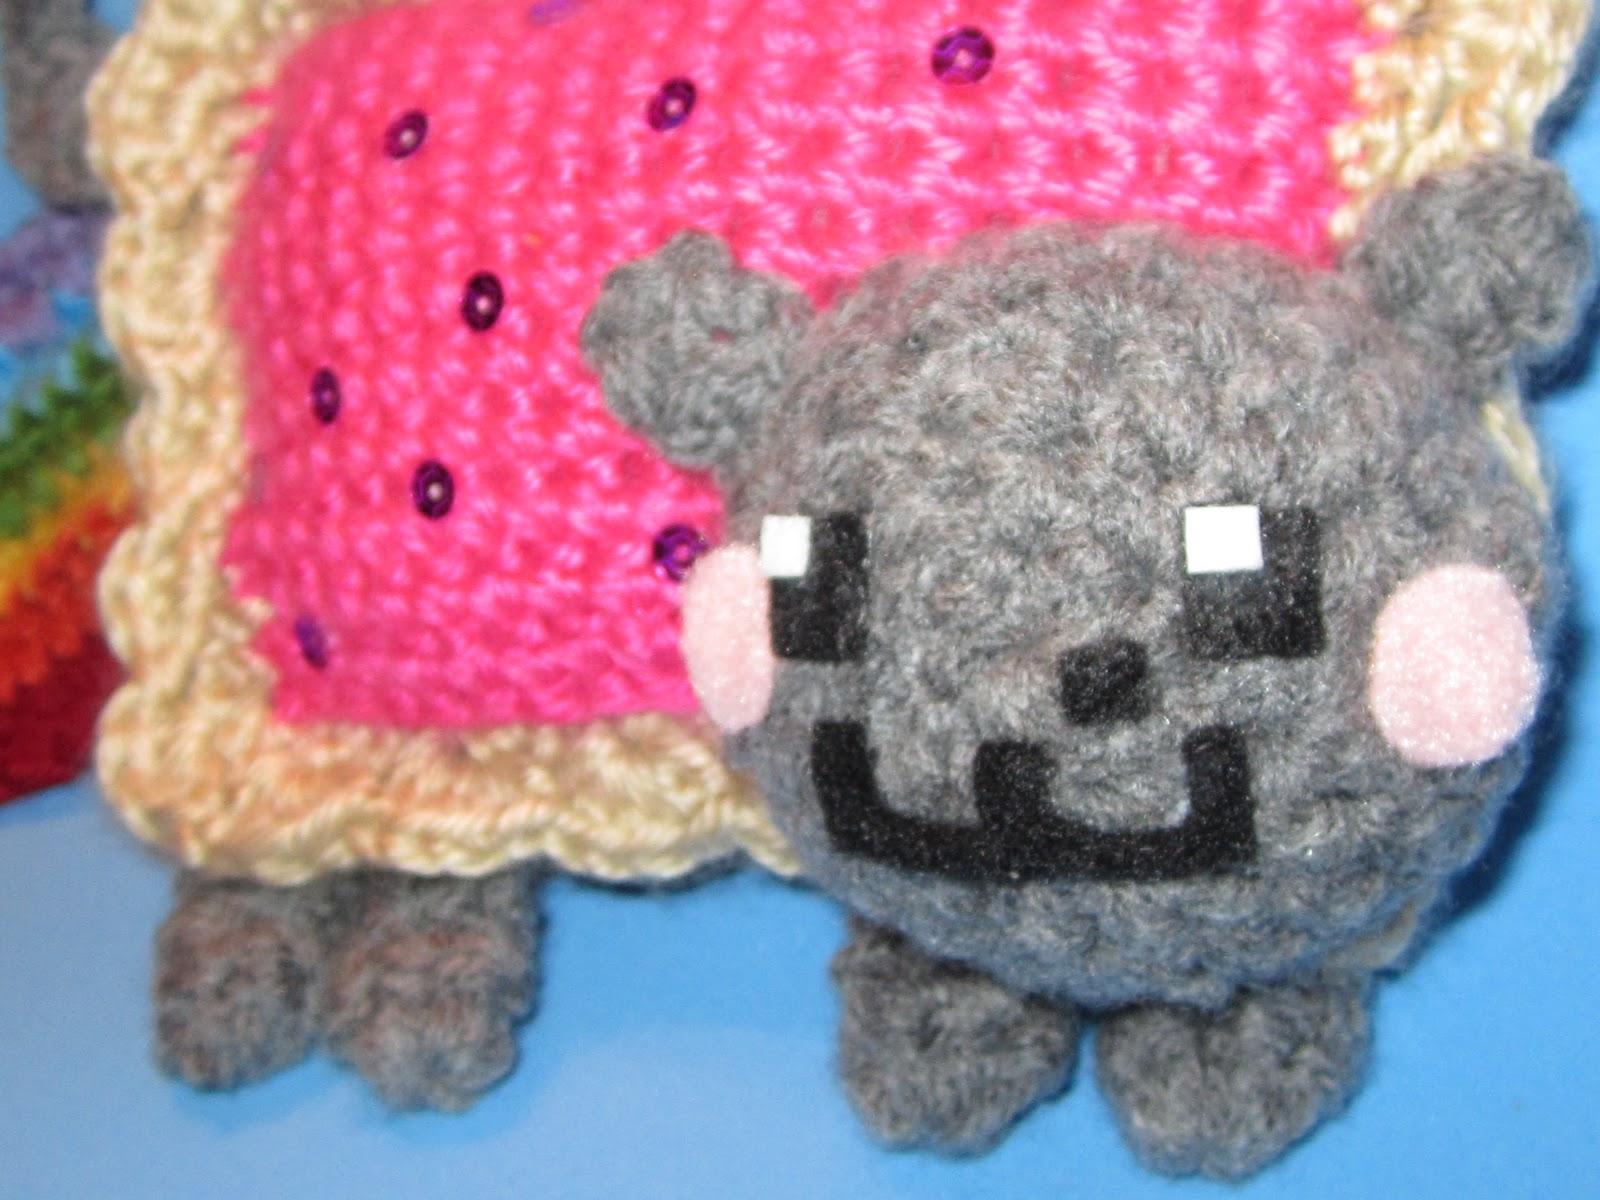 Nyan Cat Amigurumi Free Pattern : The Curious Pebble Project: Nyan Cat Amigurumi PATTERN!